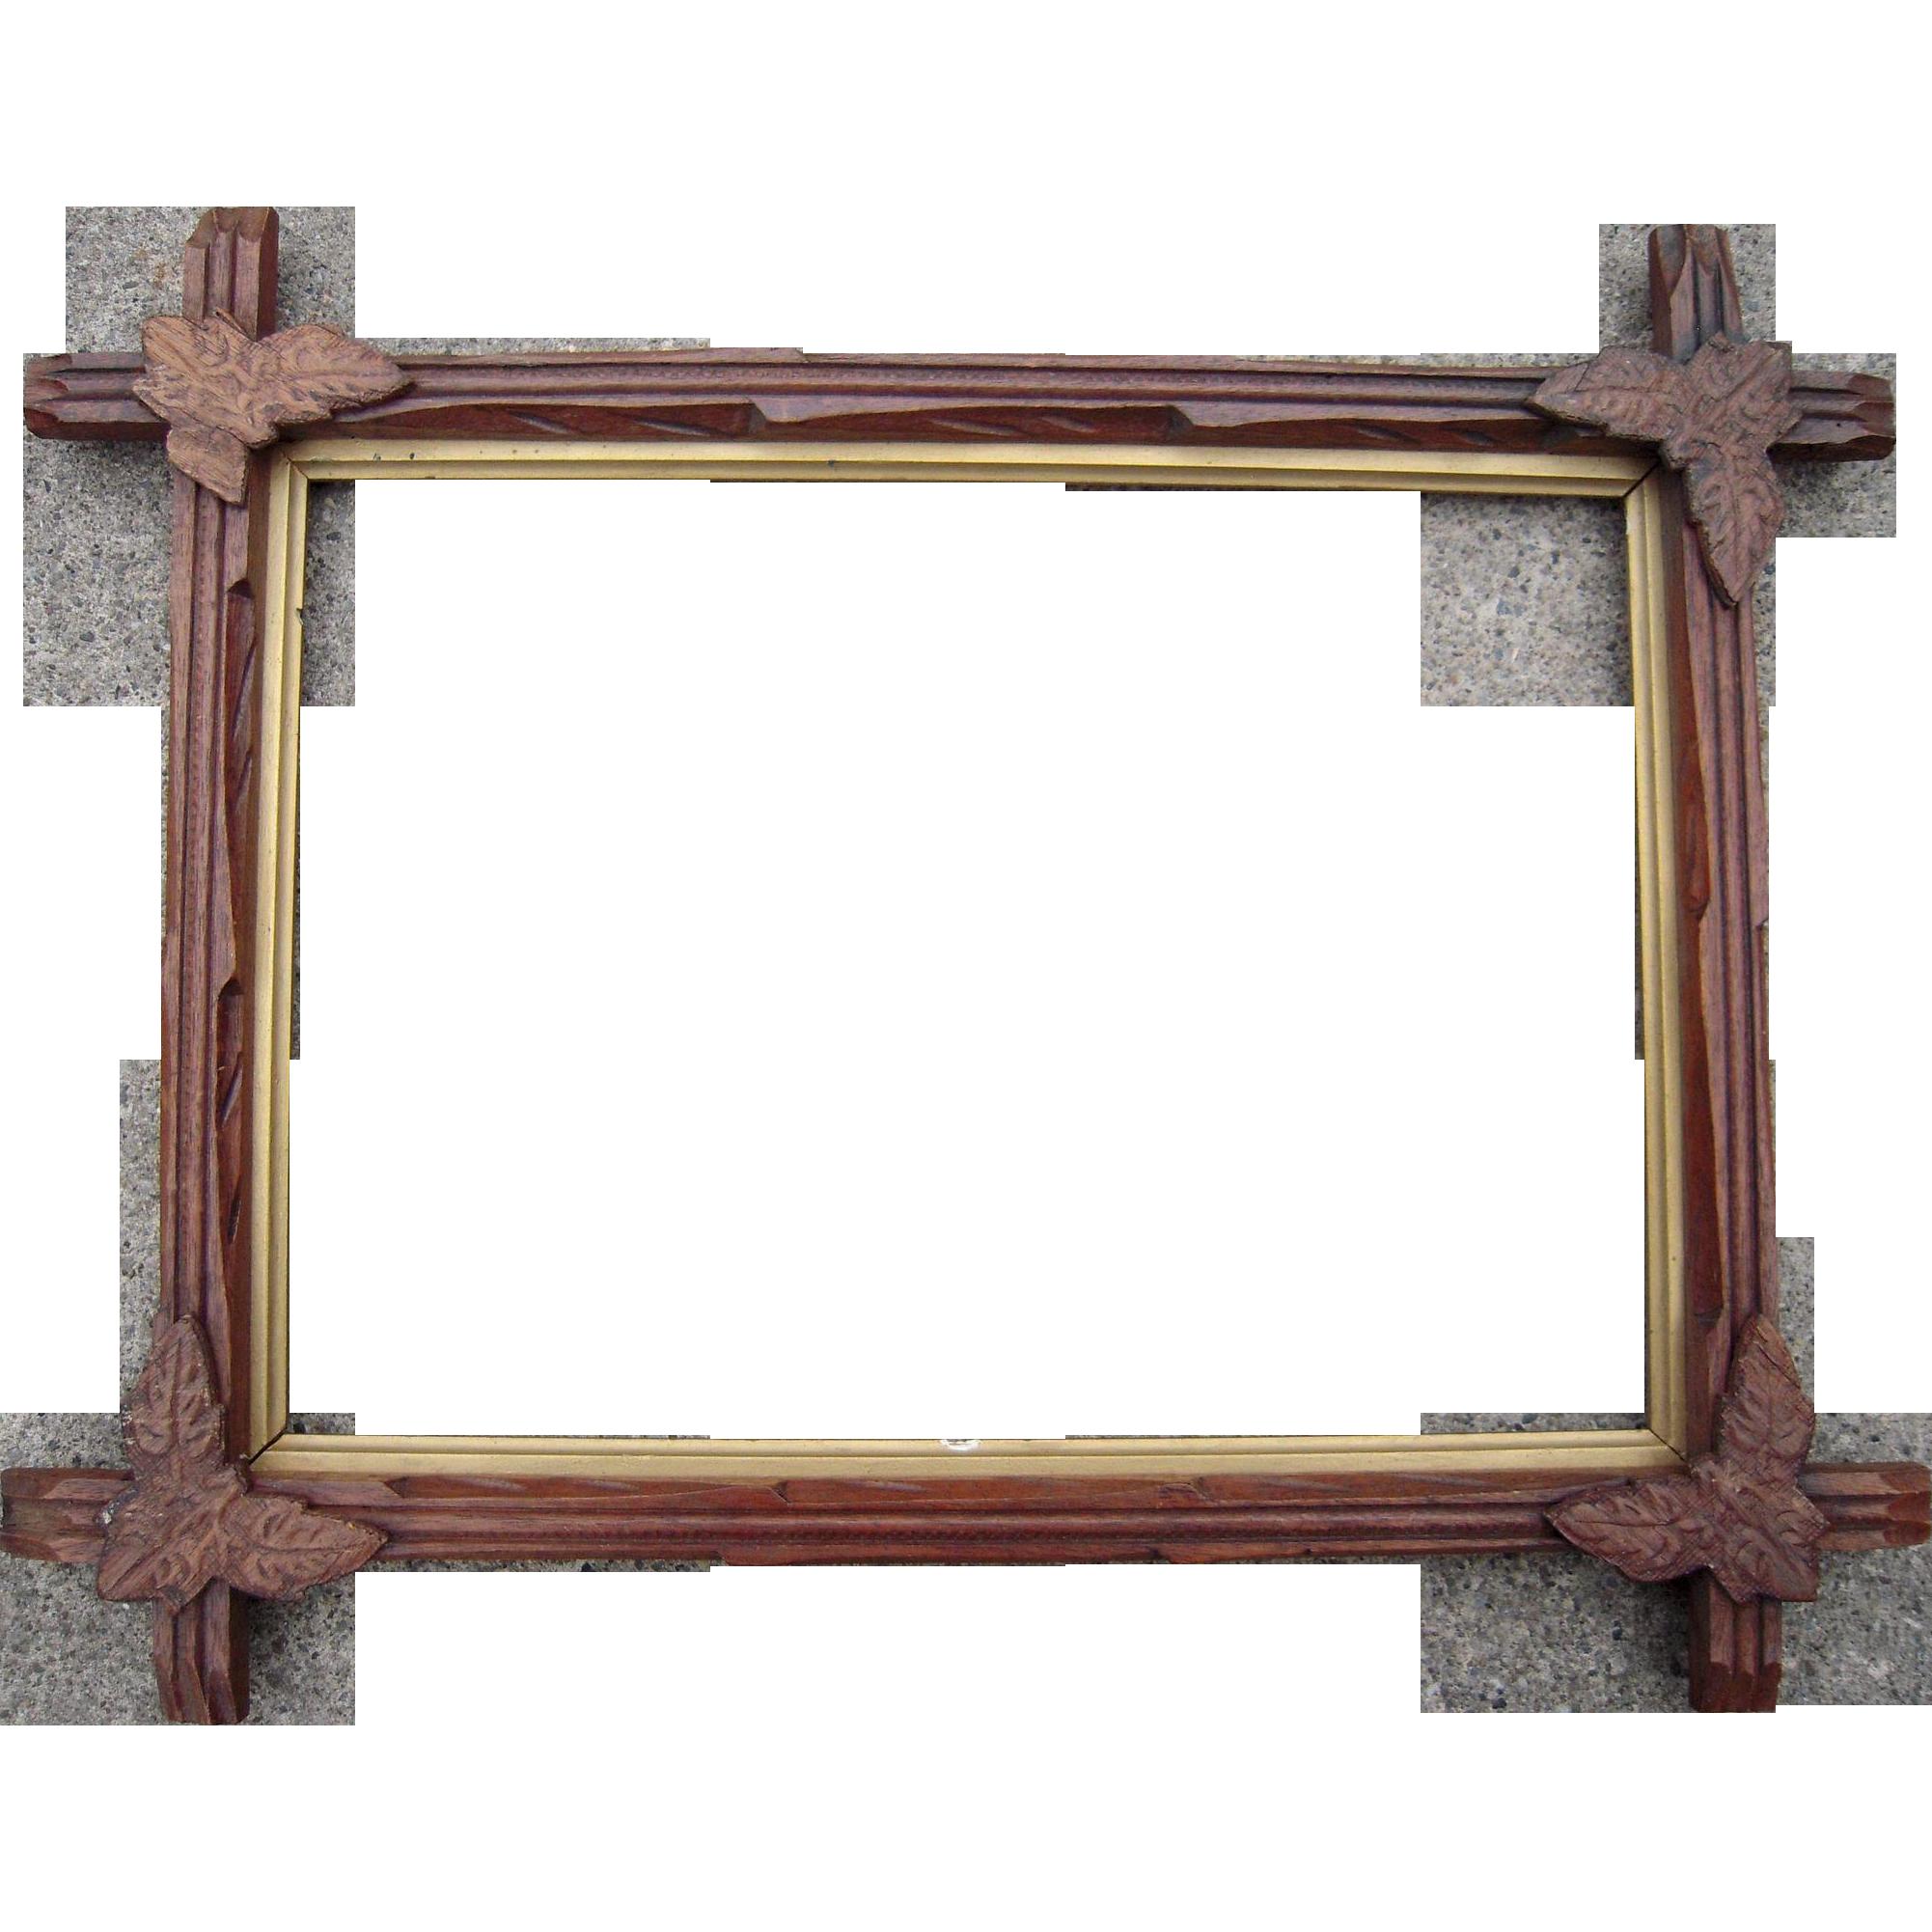 carved walnut picture frame w corner leaves 10 x 14 2 from bluesprucerugsandantiques on ruby lane. Black Bedroom Furniture Sets. Home Design Ideas